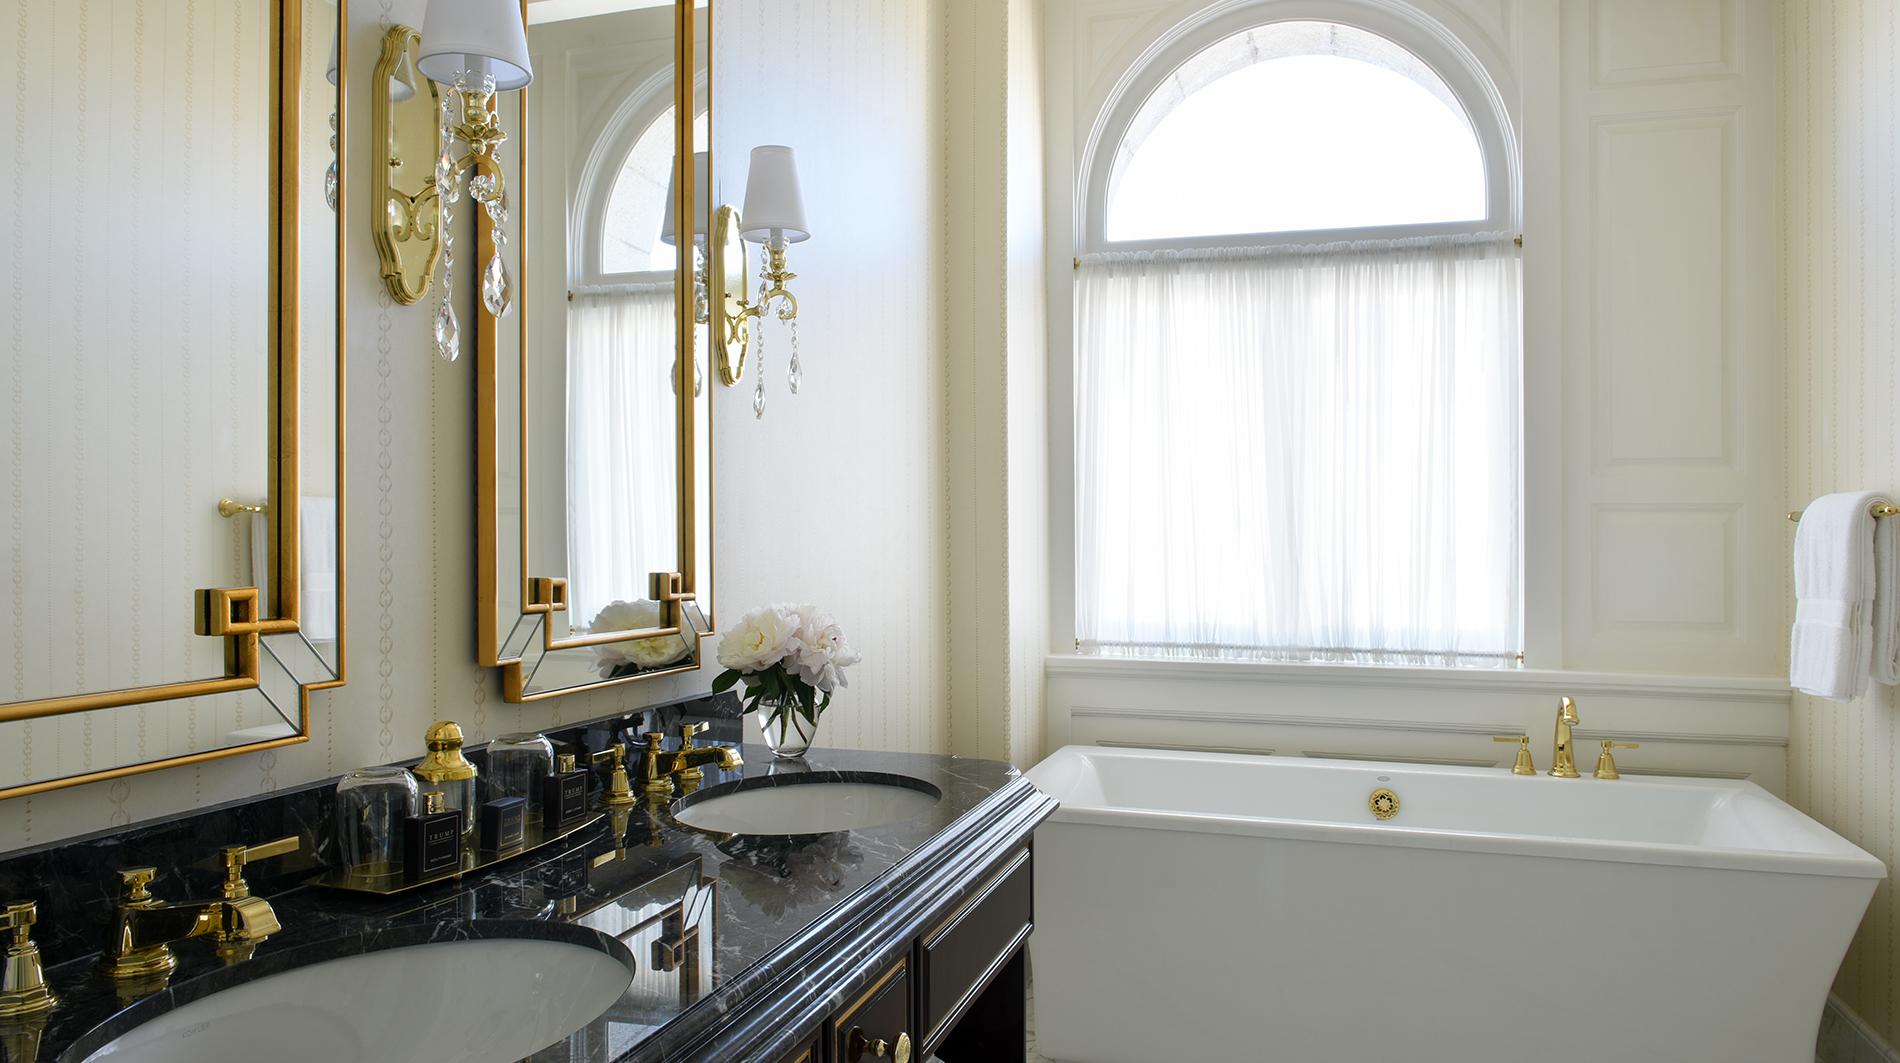 Trump international hotel washington dc Benjamin guest room bathroom